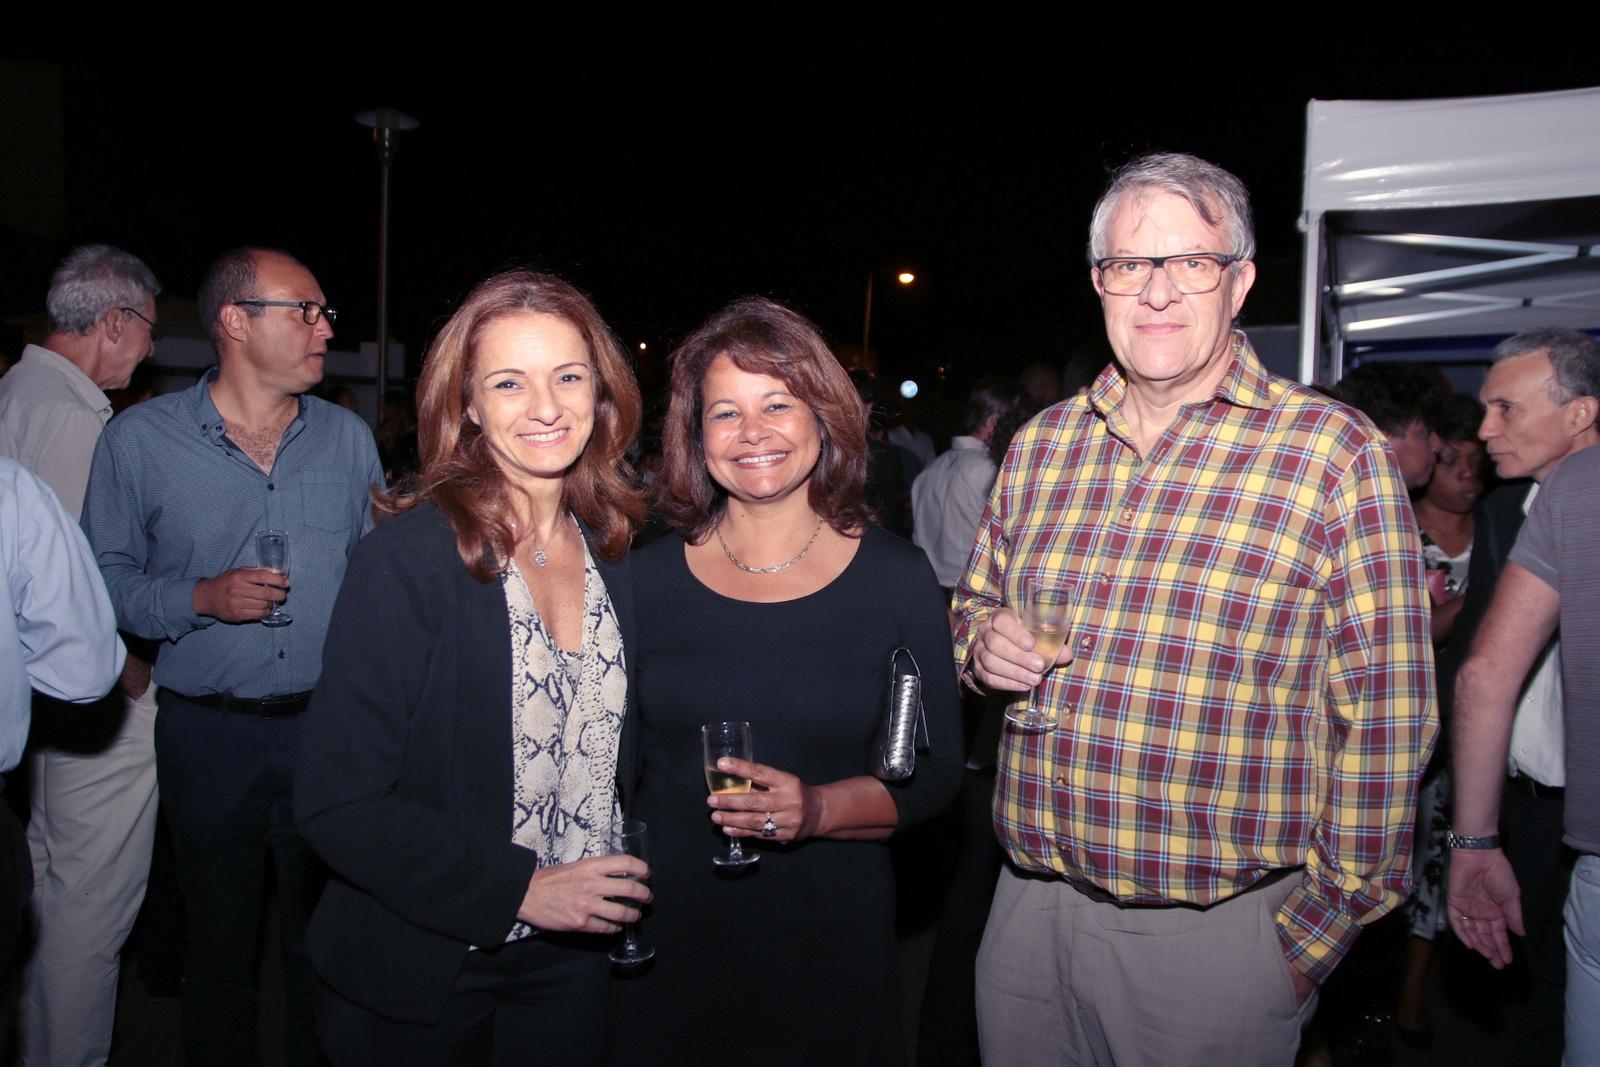 Patricia Paoli, Claudine et Philippe Lorin